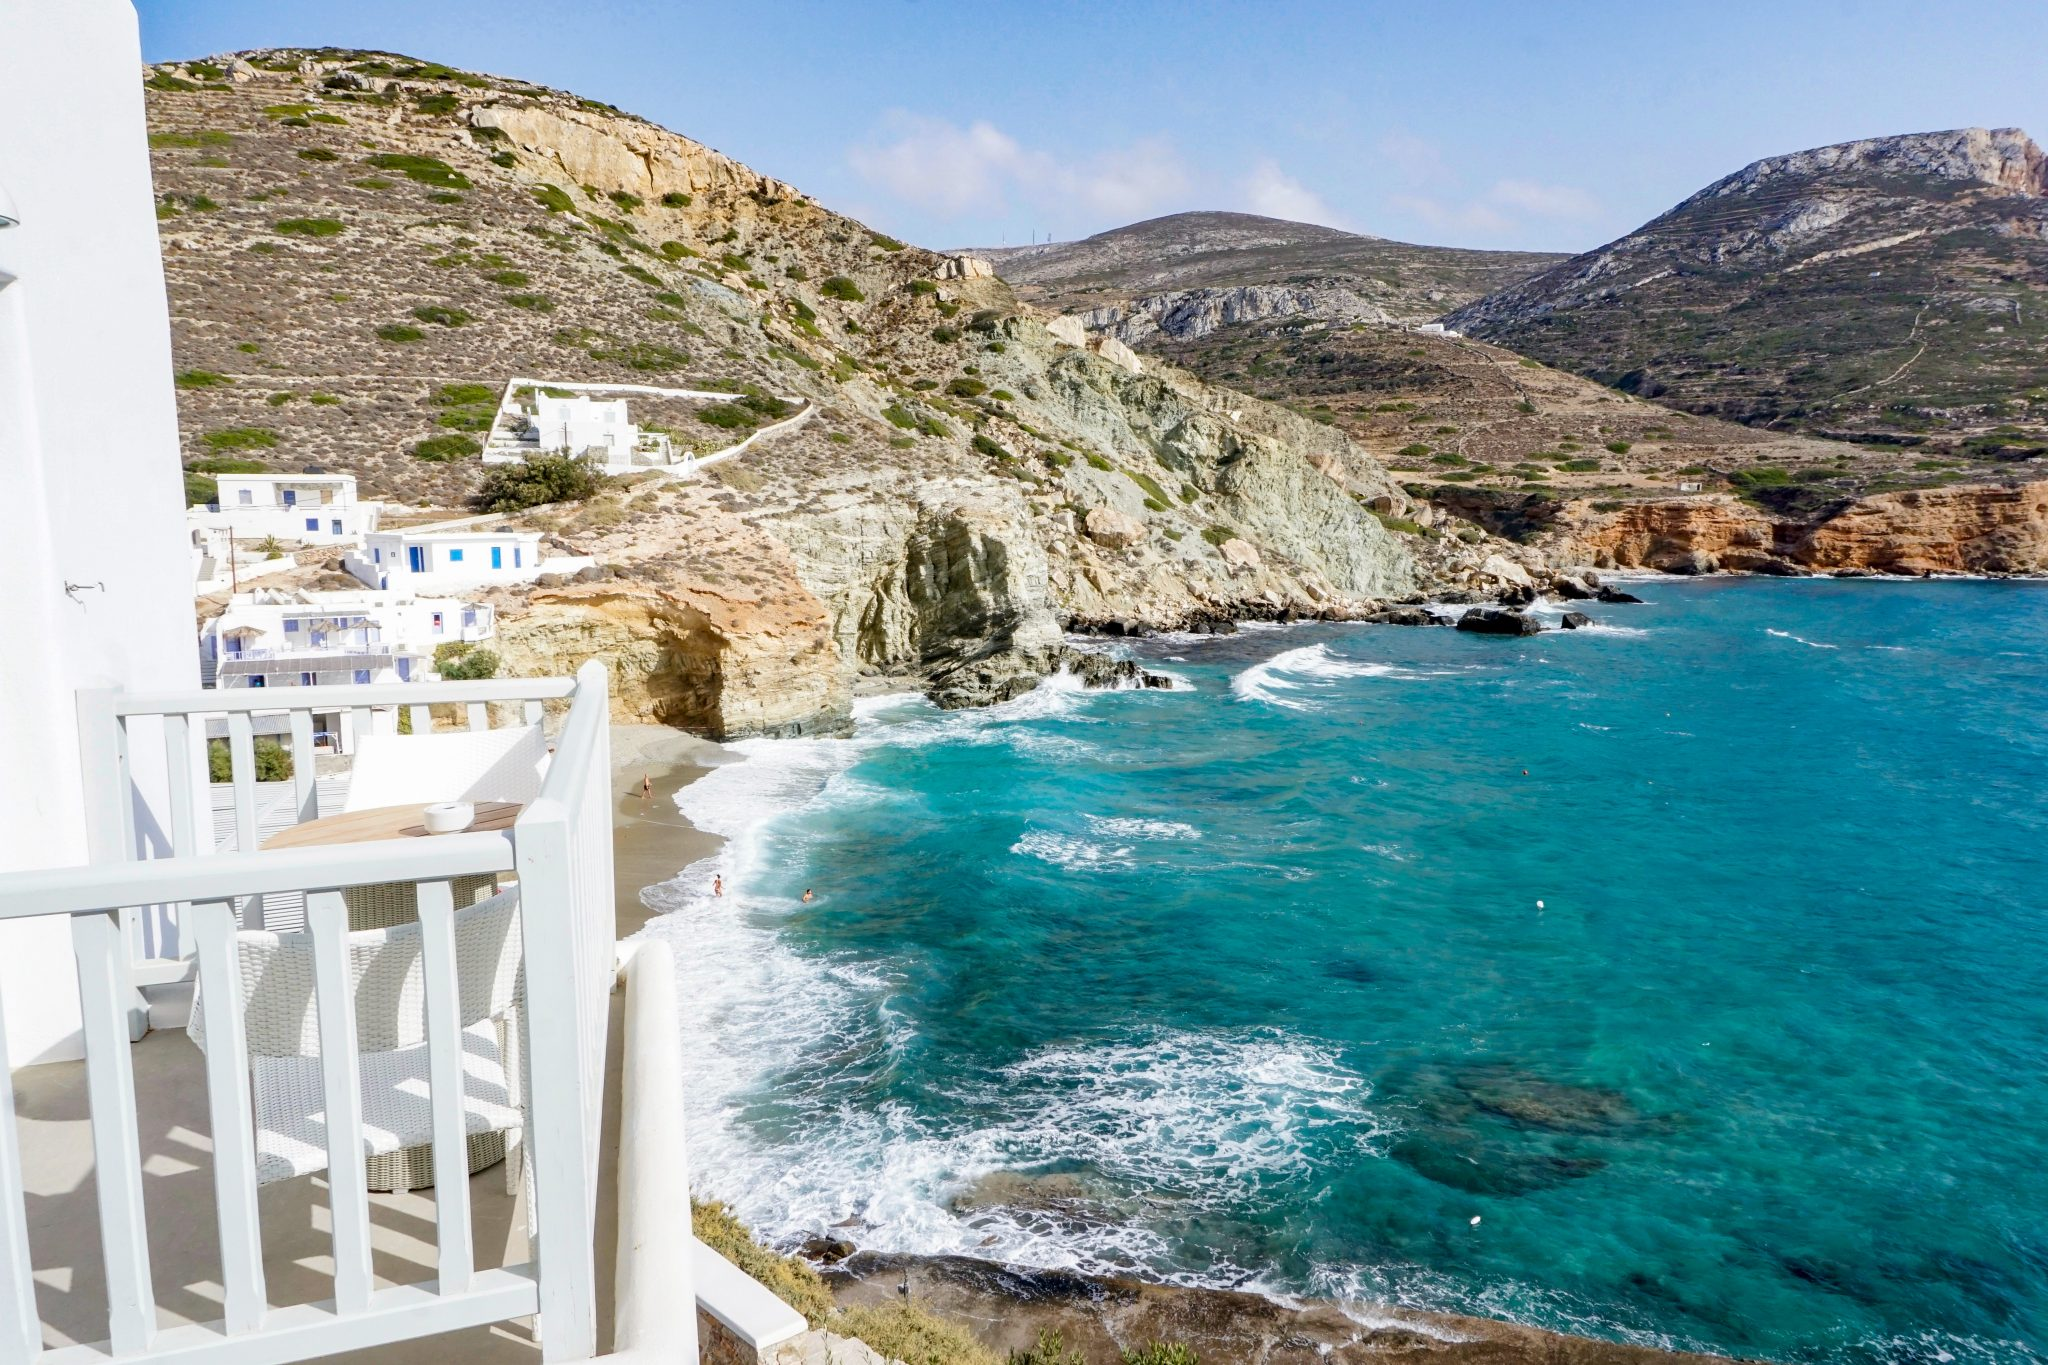 Blue Sand Hotel beach, Folegandros, Greece